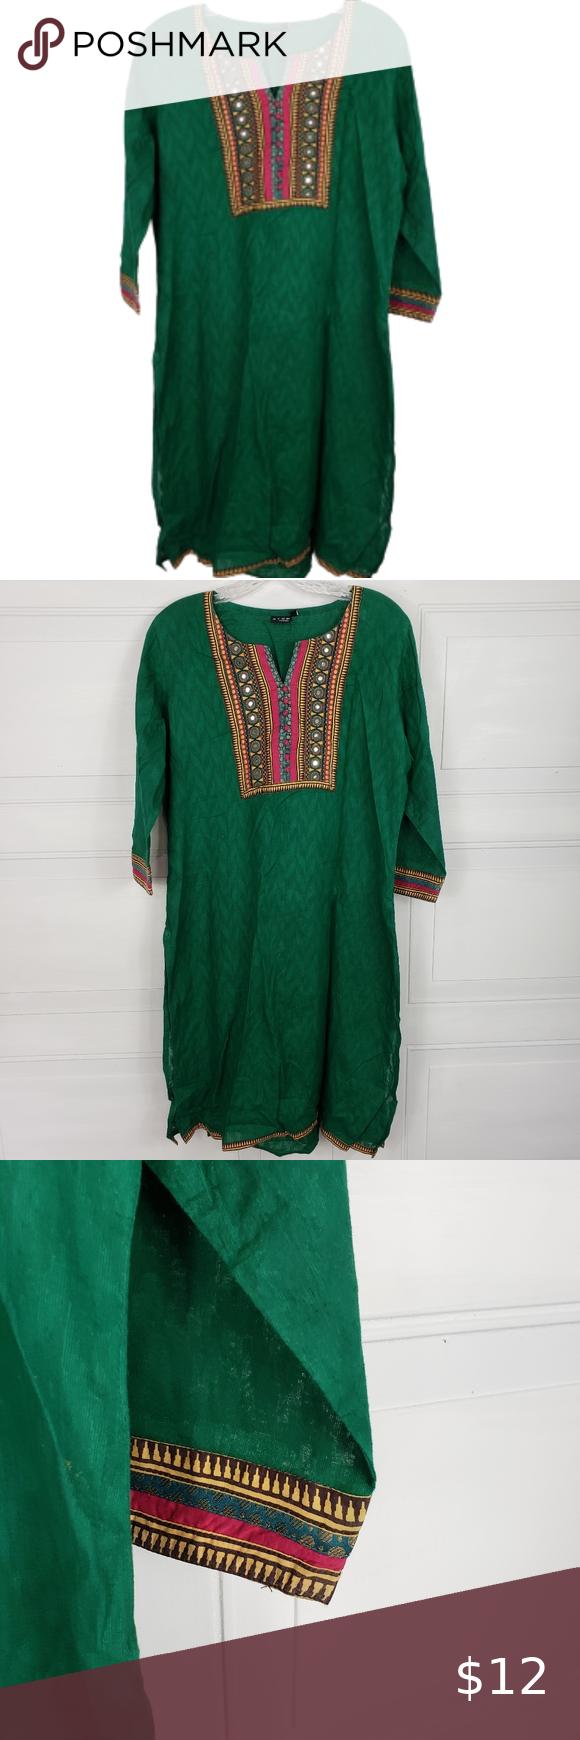 20/$20 Stop Everywear Dashiki Embroidered Tunic Stop Everywear ...